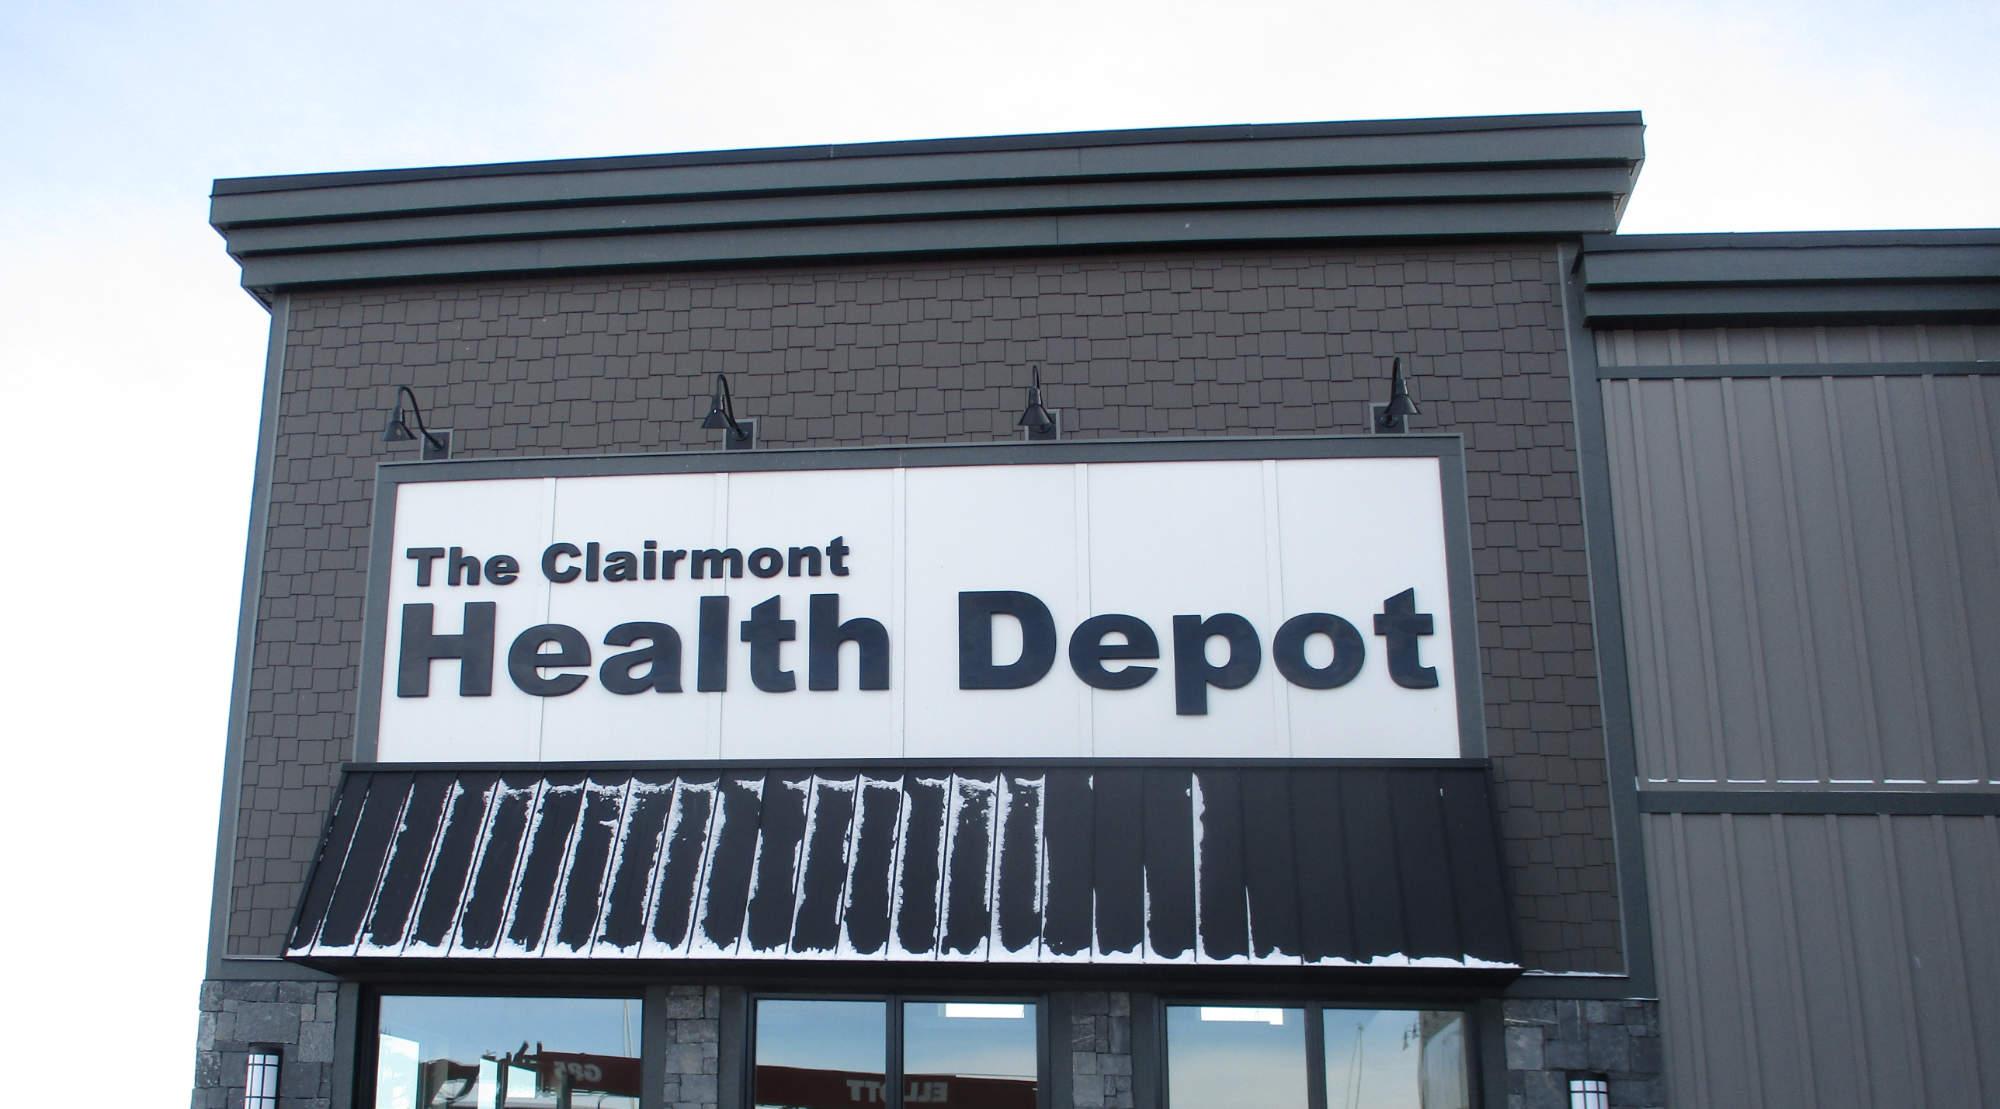 exterior sign - health depot